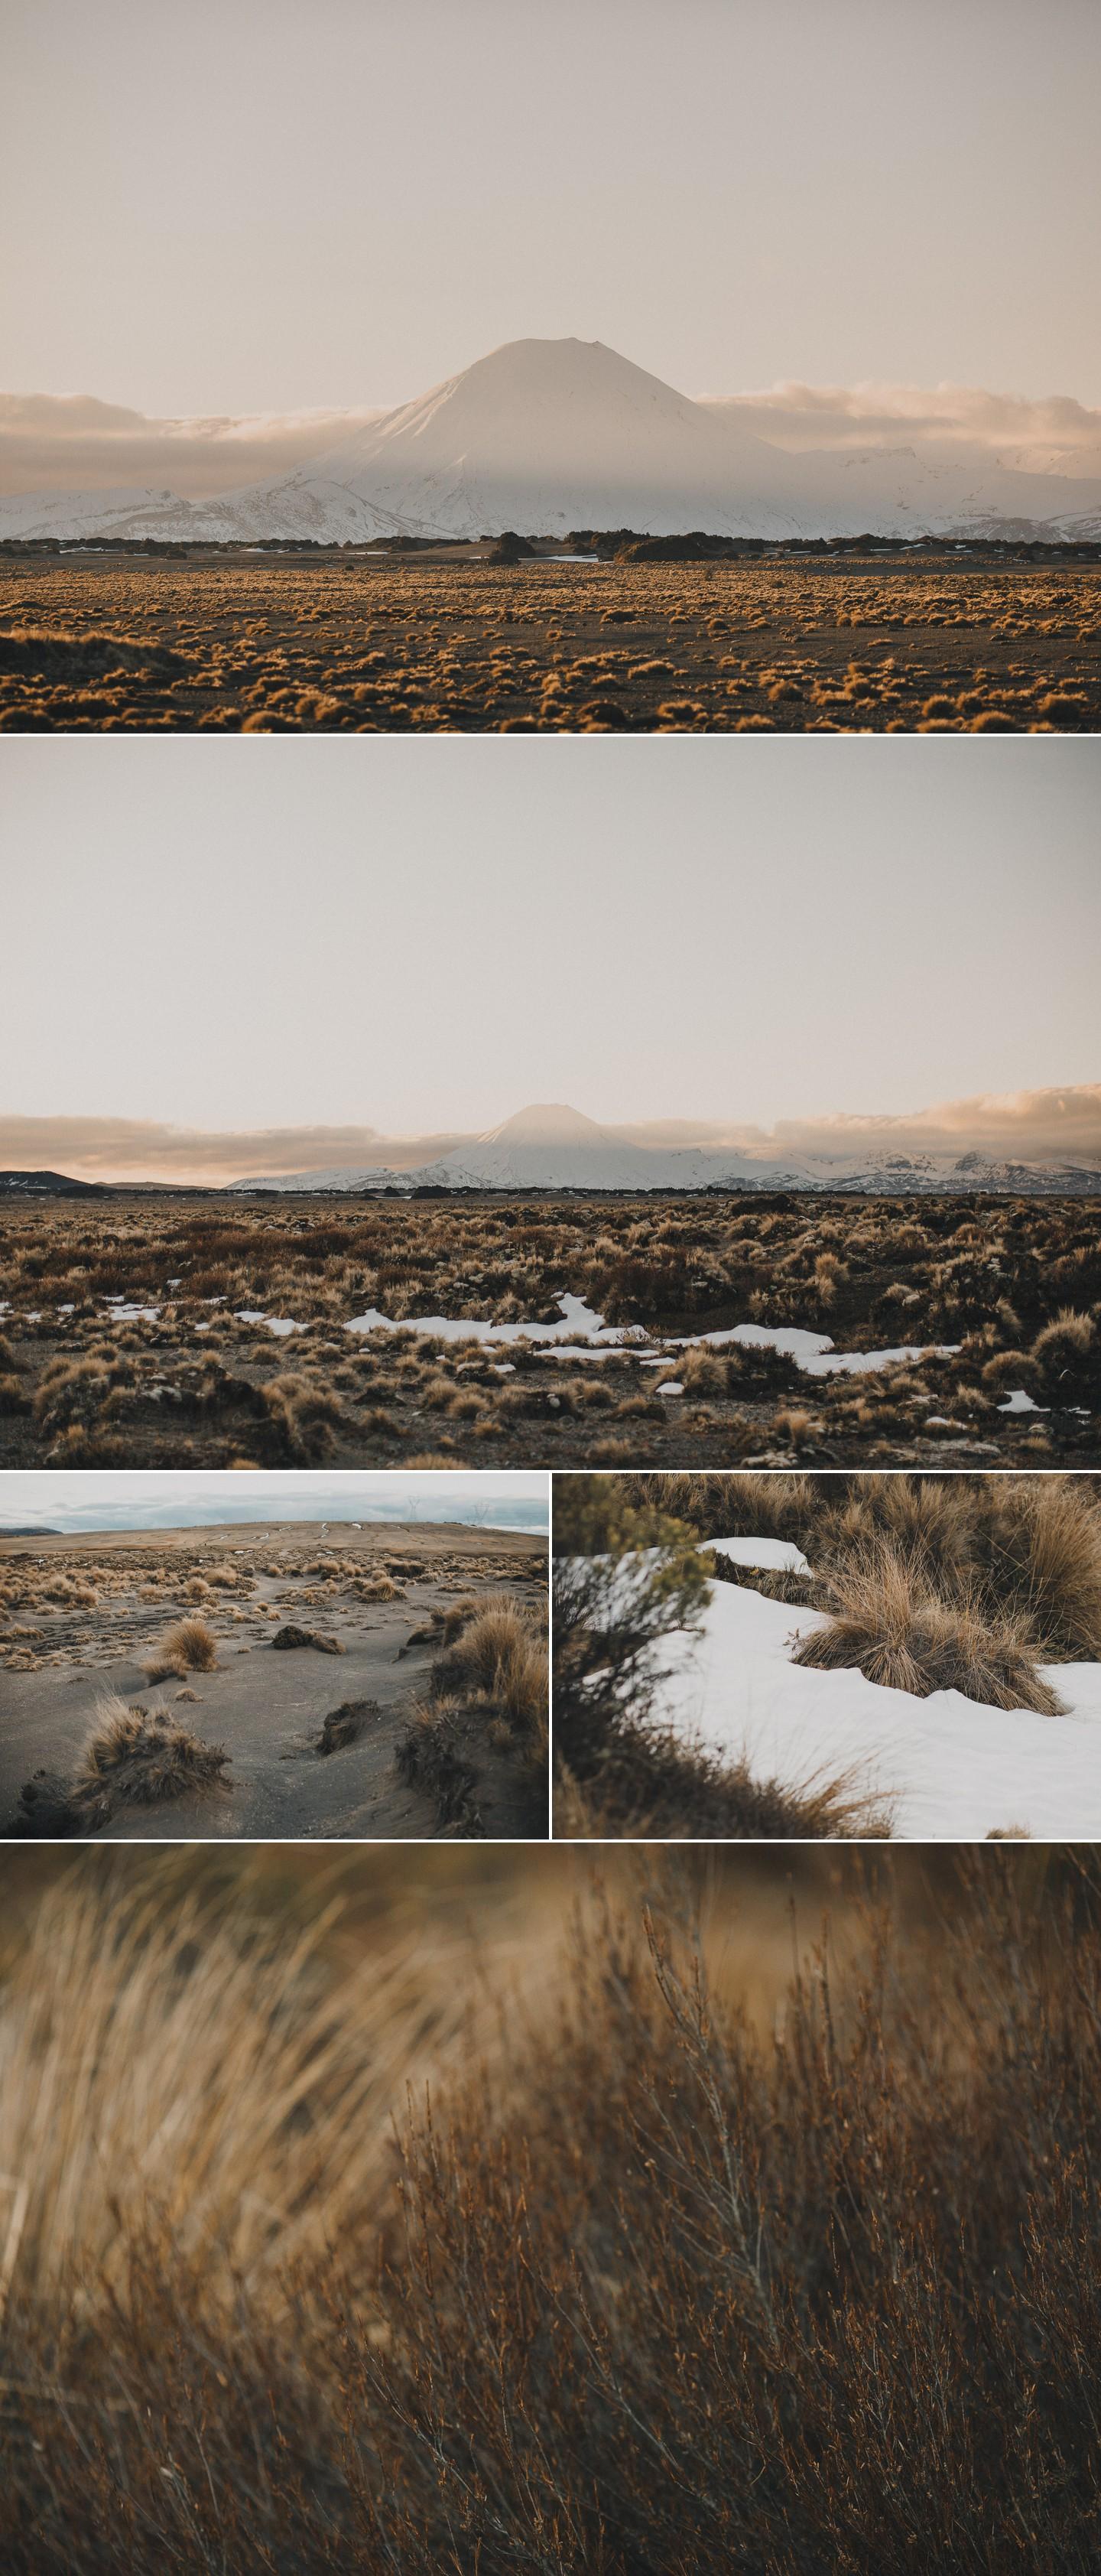 Desert road New Zealand in August